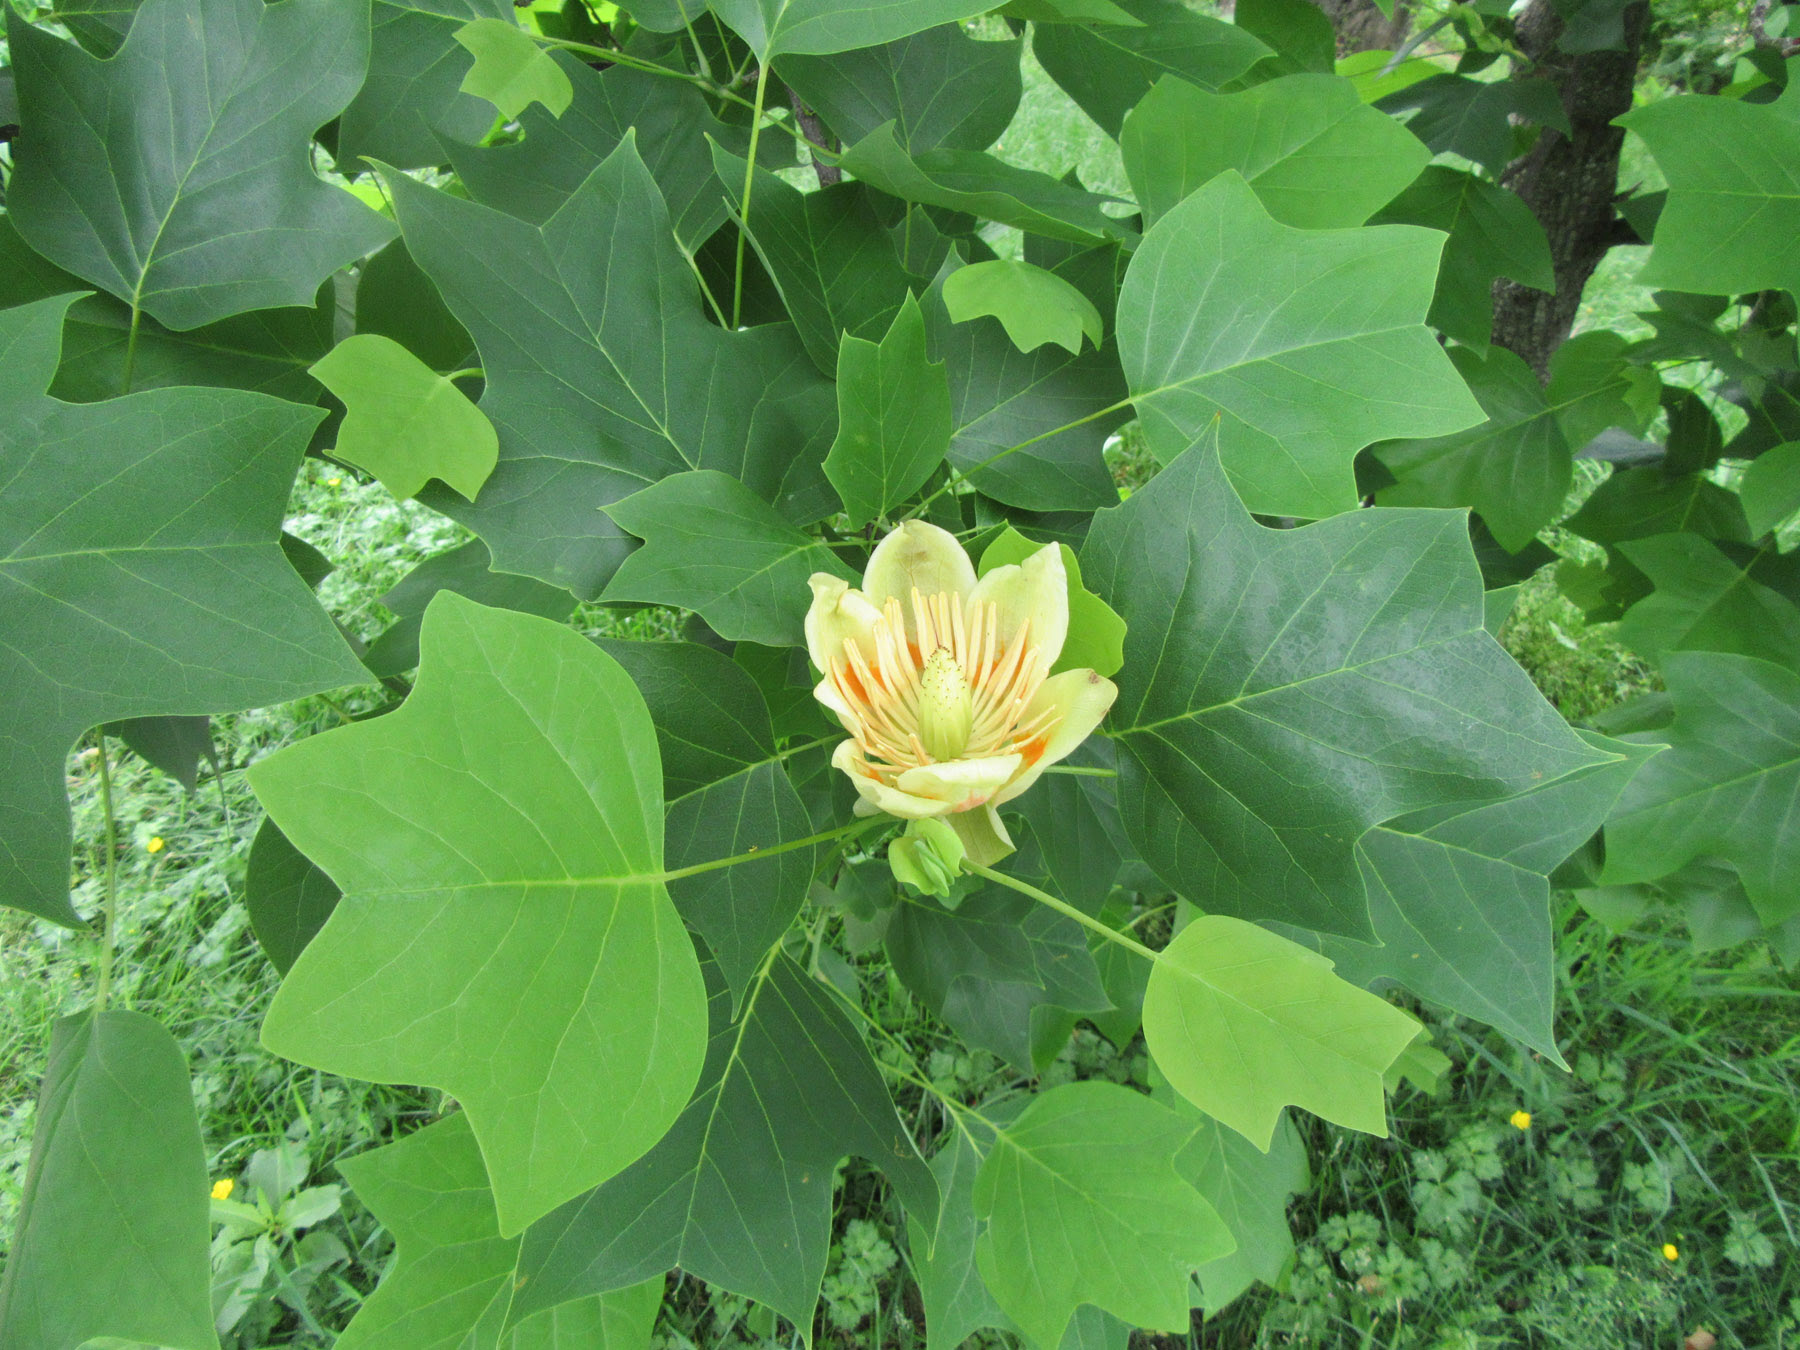 Dekorte Tulip Tree In Bloom The Meadowlands Nature Blog